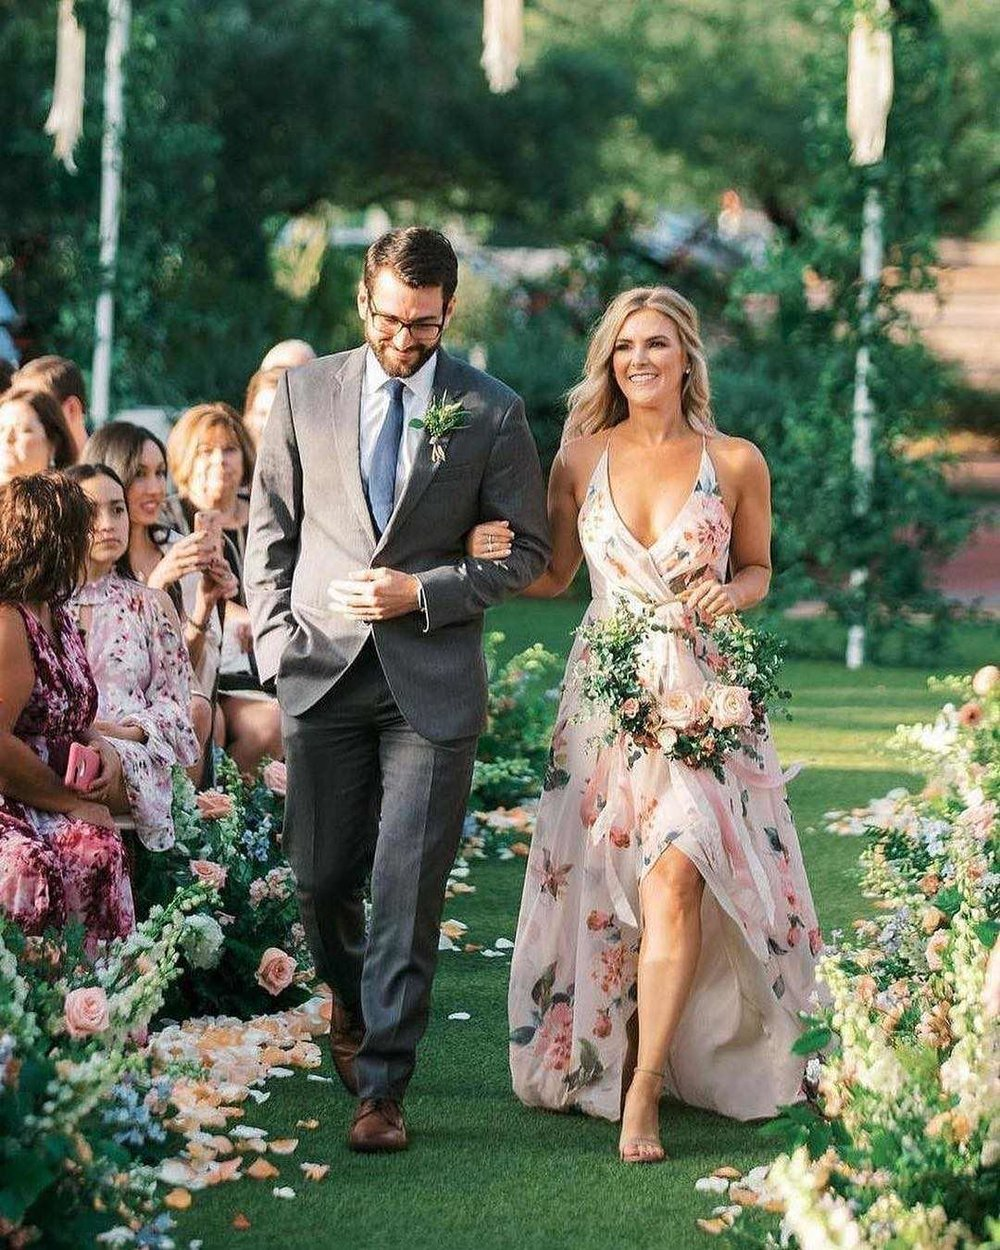 Floral Bridesmaid Dress.jpg